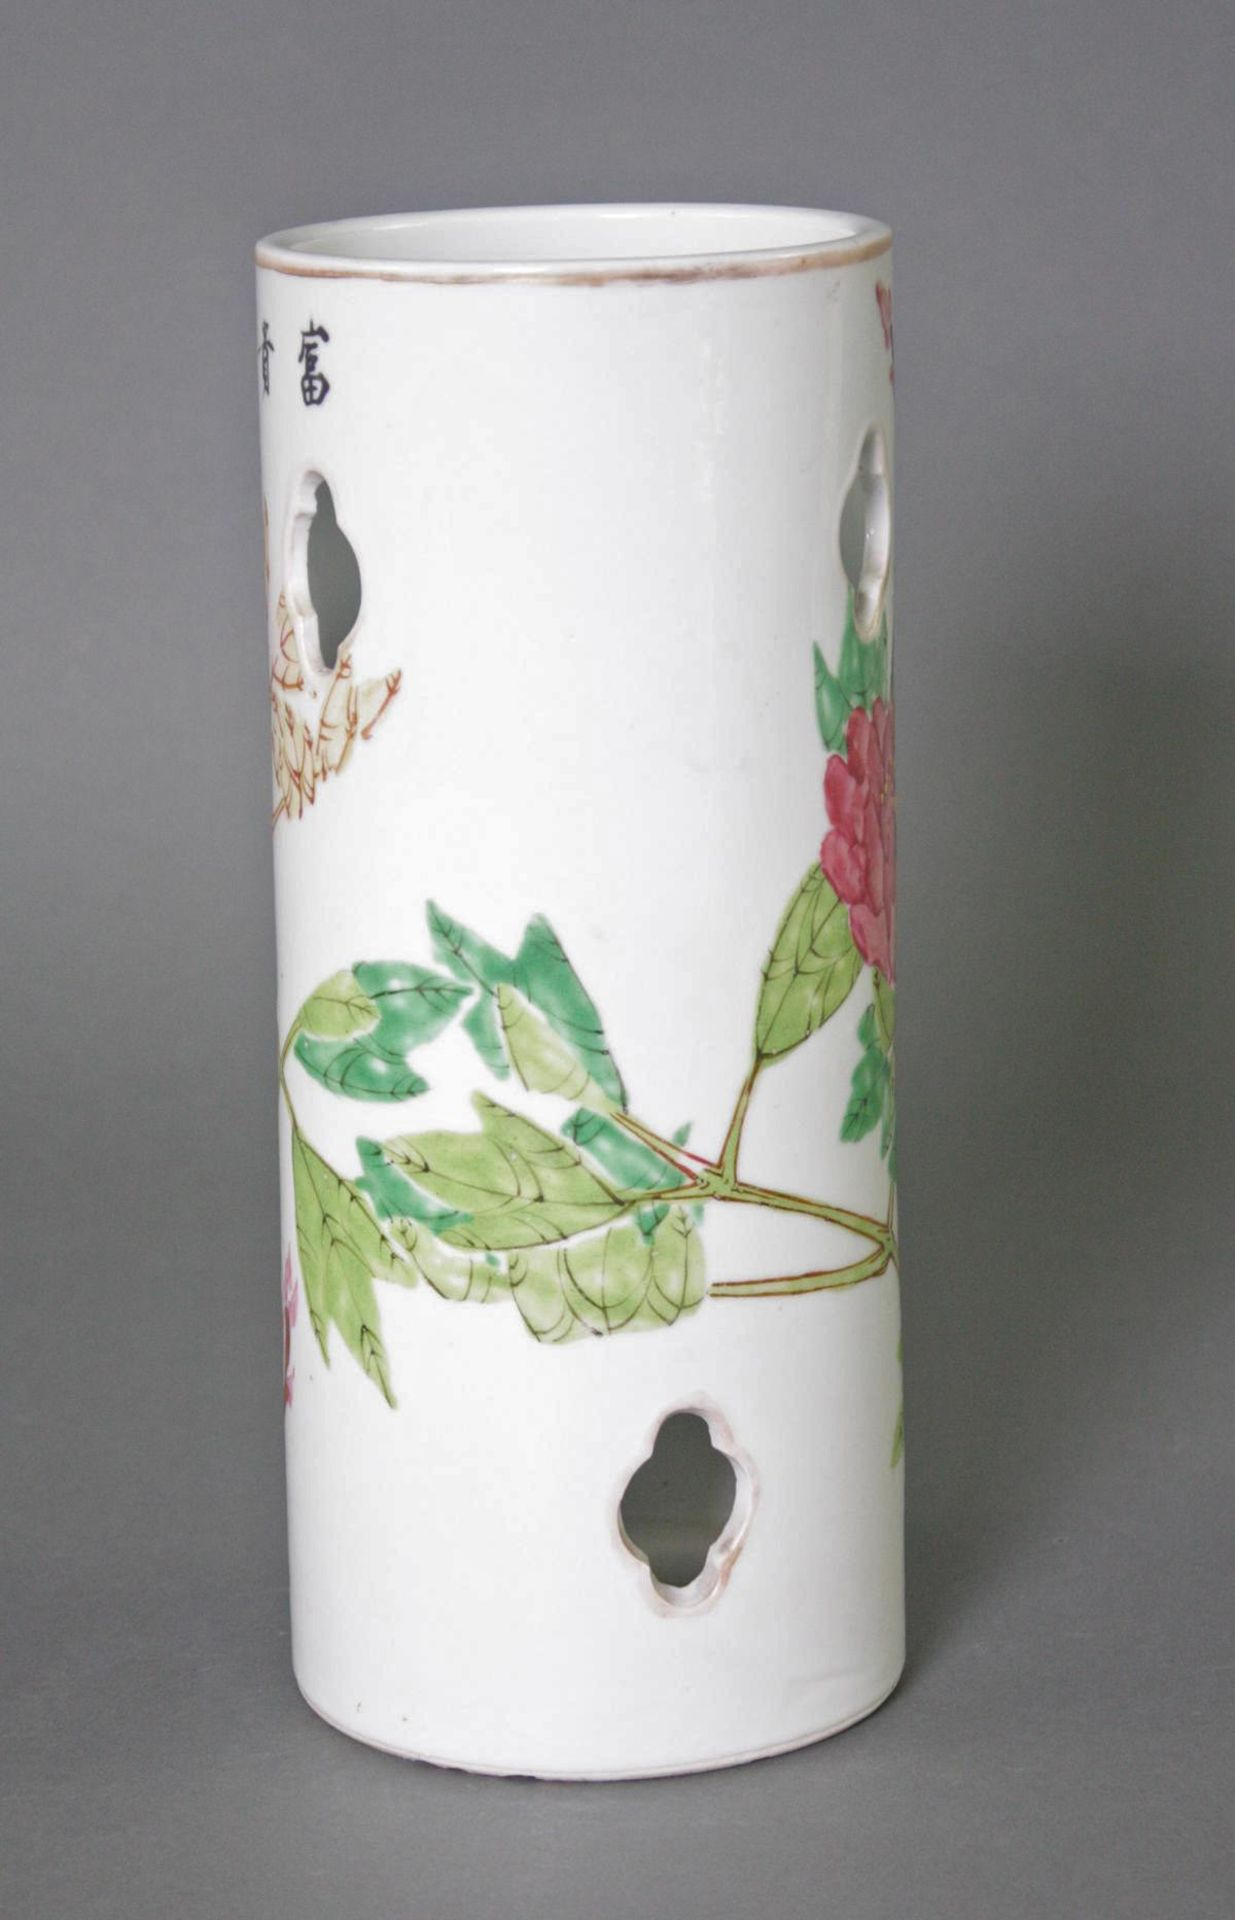 Hutständer, China Ende 19. Jahrhundert - Bild 4 aus 6